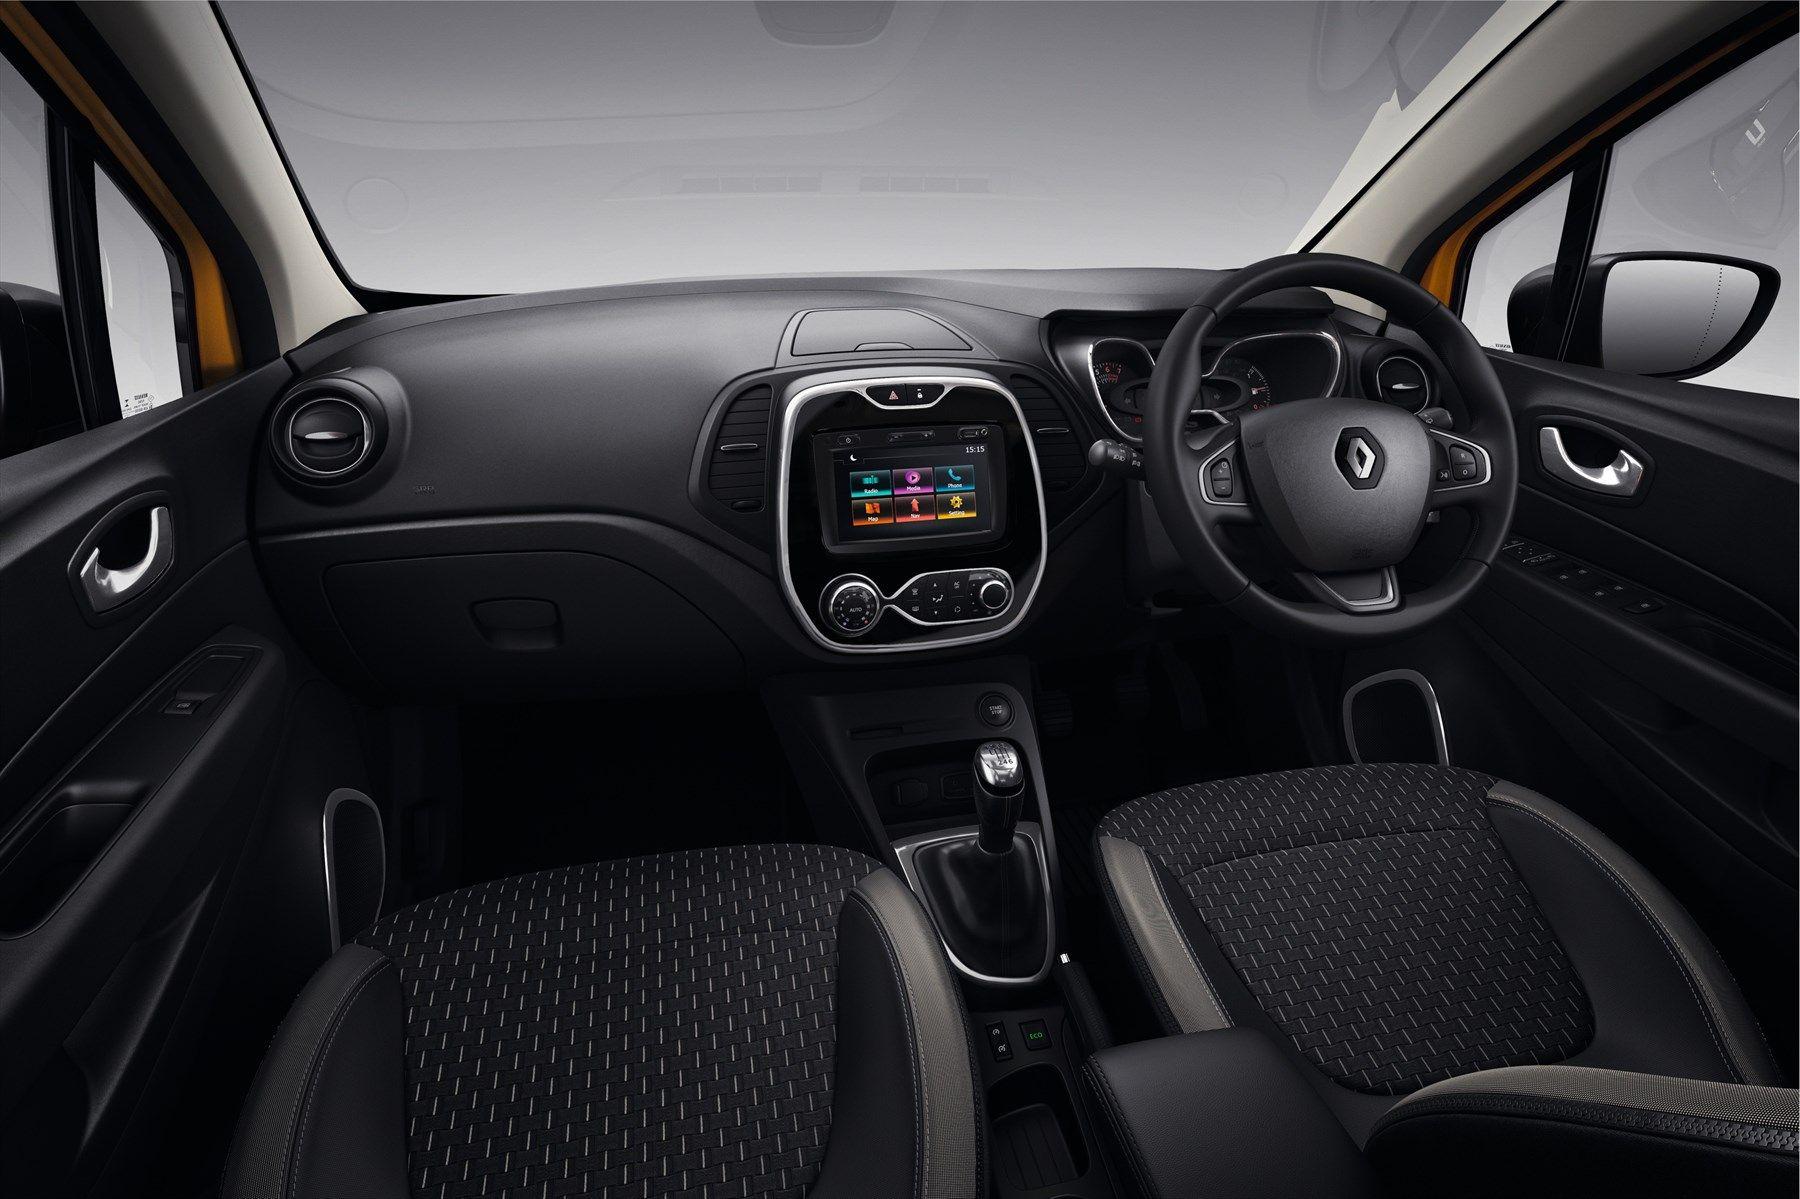 captur-dynamique-interior-rhd_1800x1800